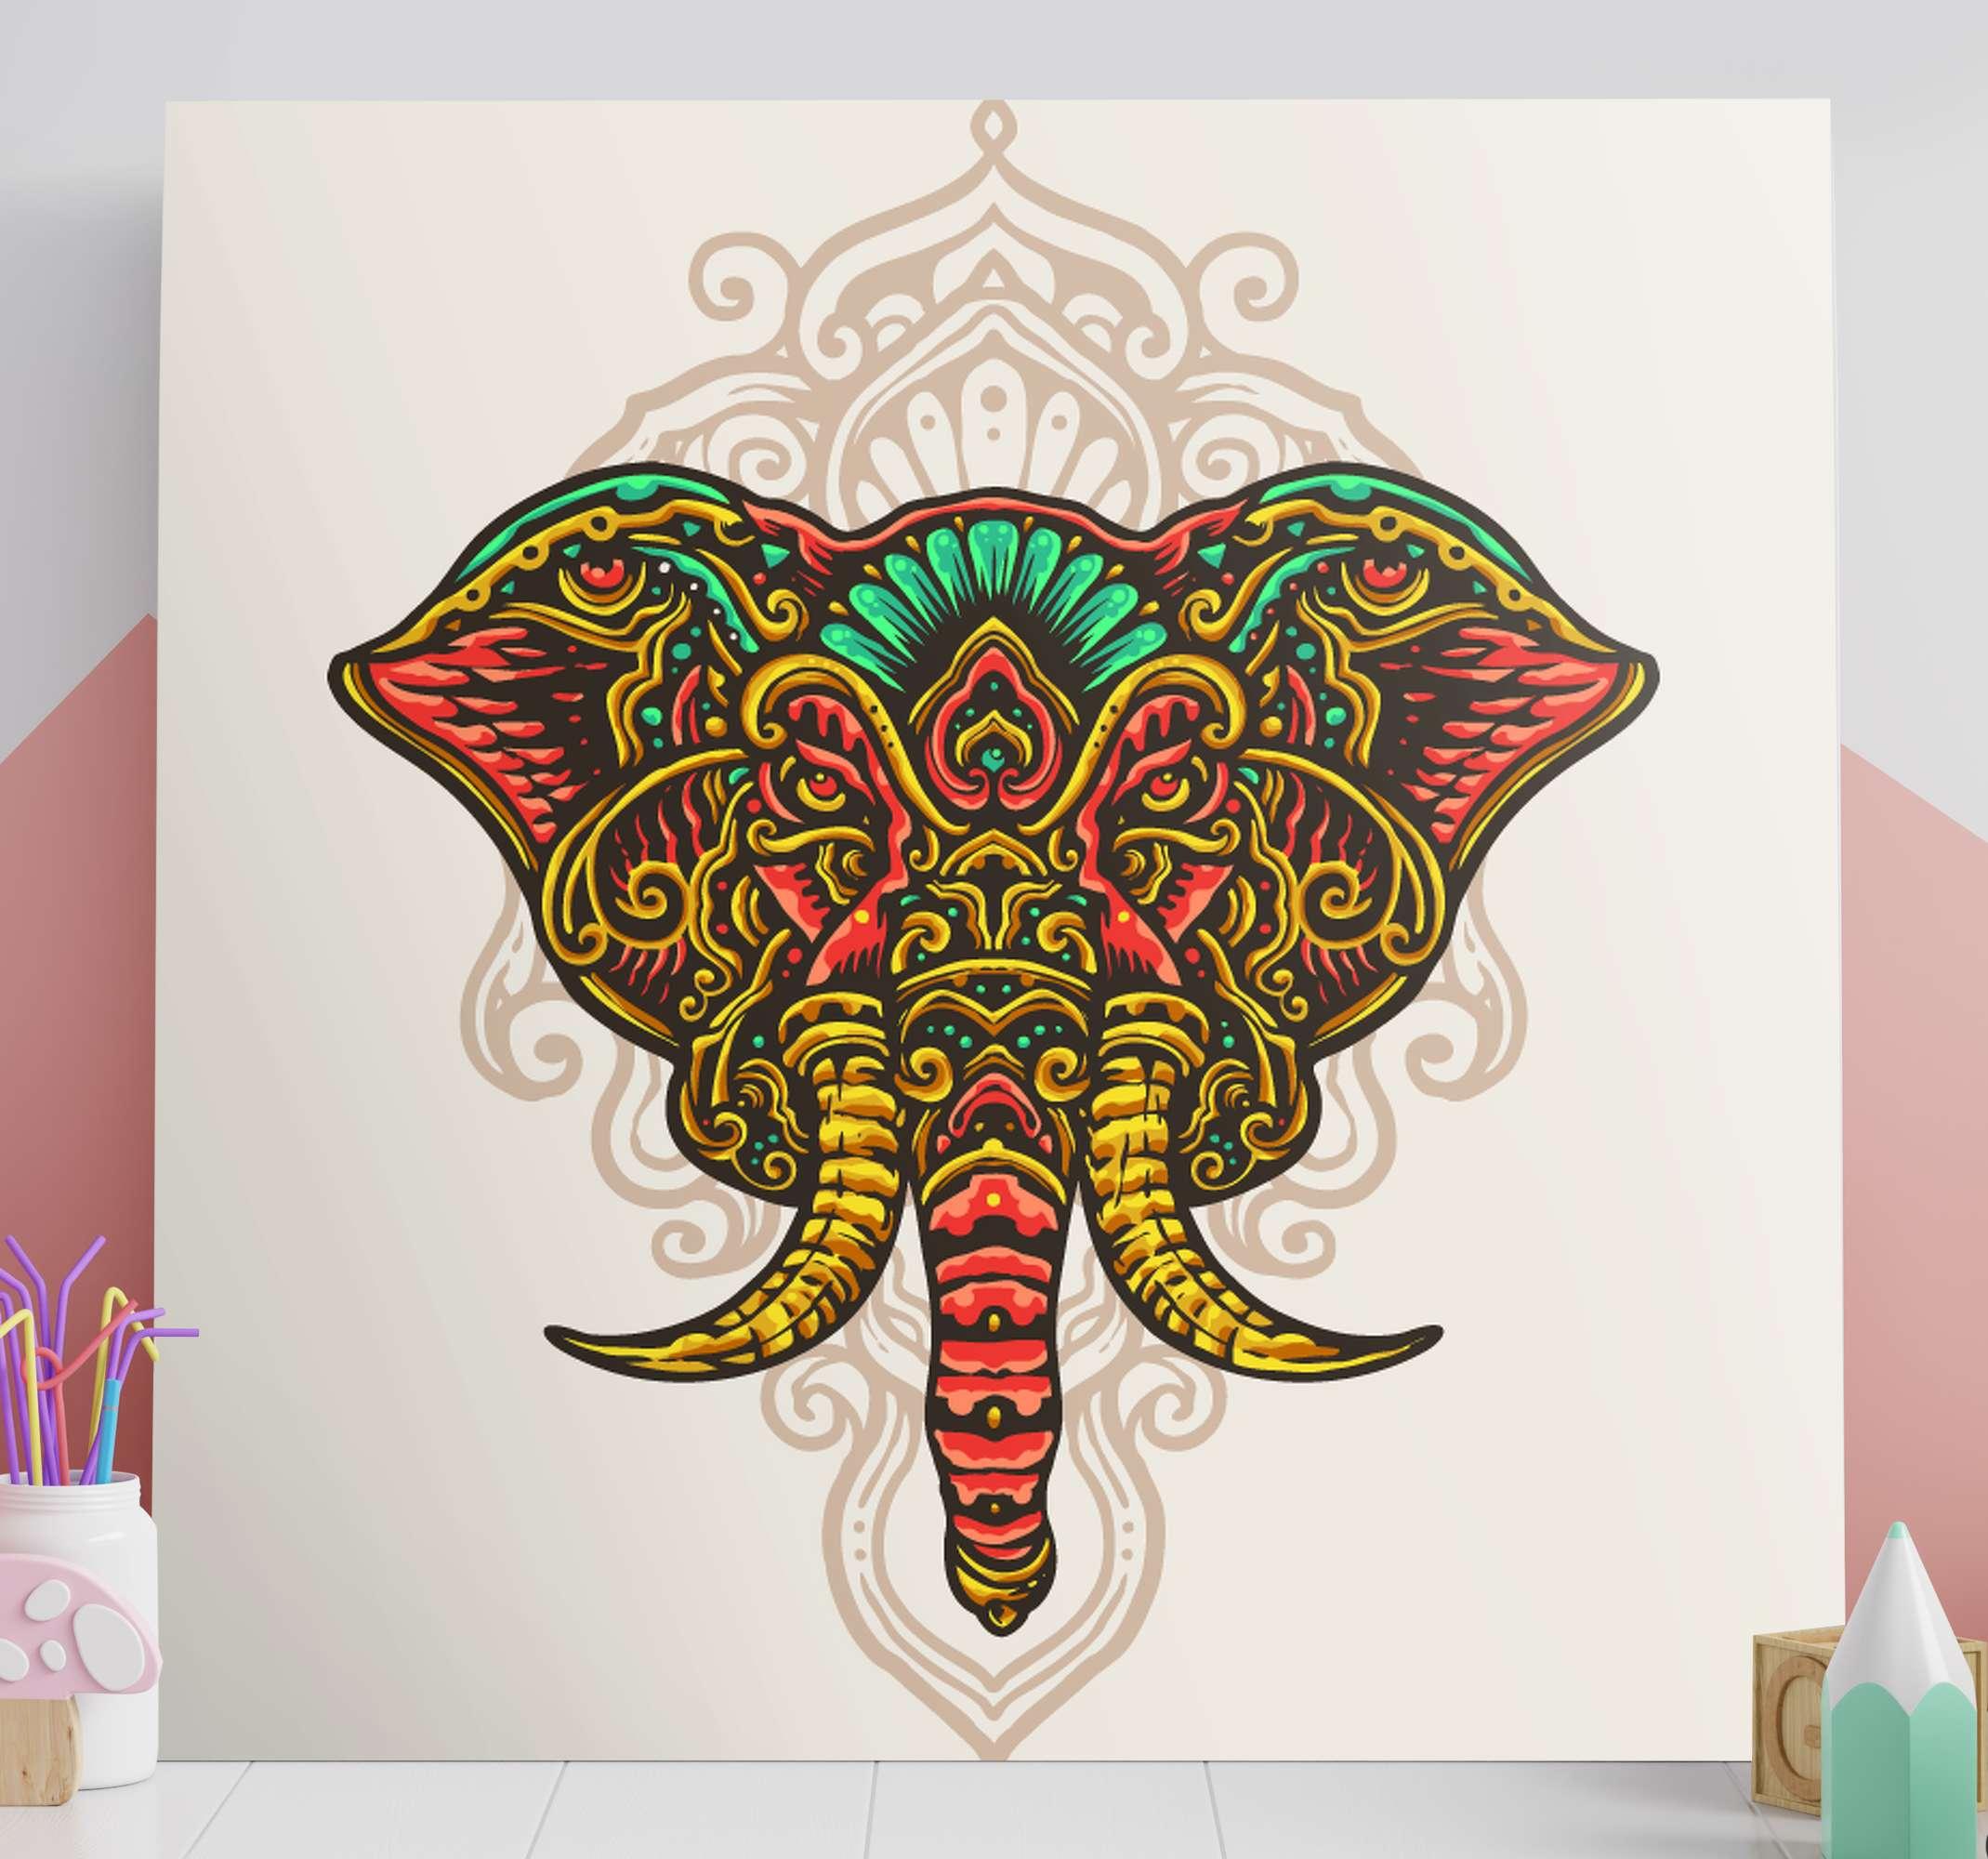 TenStickers. πολύχρωμη ινδική μάνταλα ελέφαντα καμβά τέχνη. μια εκτύπωση καμβά ελέφαντα με μάνταλα για τους λάτρεις του παραδοσιακού και φυλετικού εμπνευσμένου σχεδιασμού. ιδανικό για να διακοσμήσετε οποιοδήποτε χώρο και είναι πρωτότυπο.